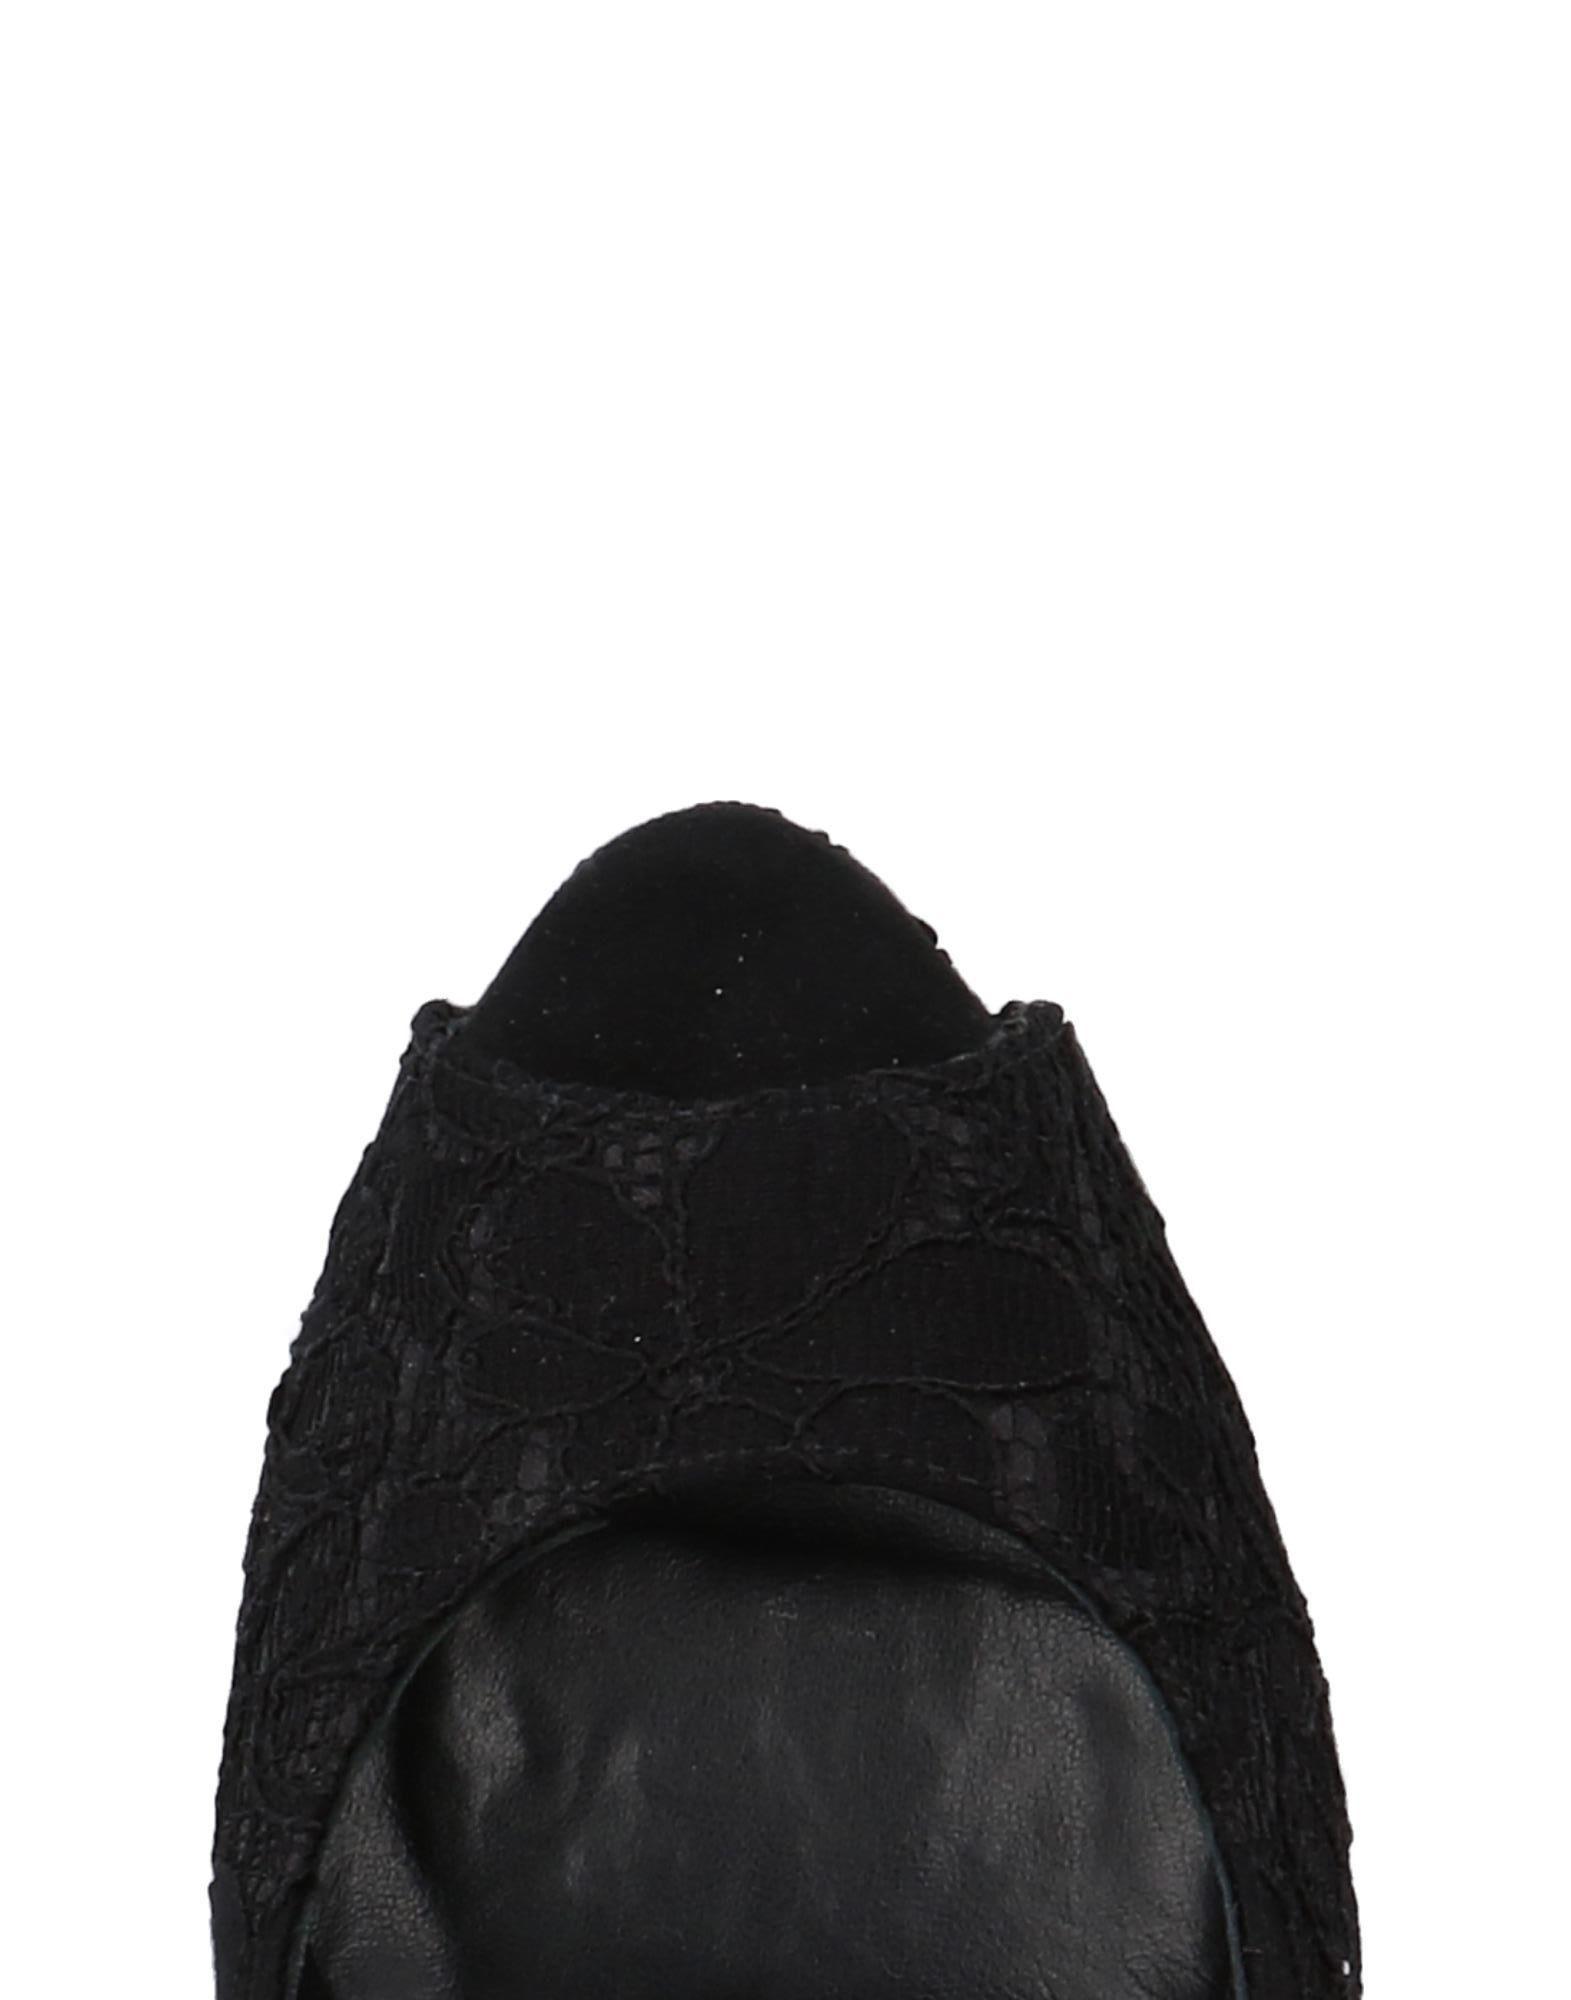 ... Liu •Jo Shoes Pumps Damen Schuhe 11498885CT Gute Qualität beliebte  Schuhe da6d6f d9a3fedf8f